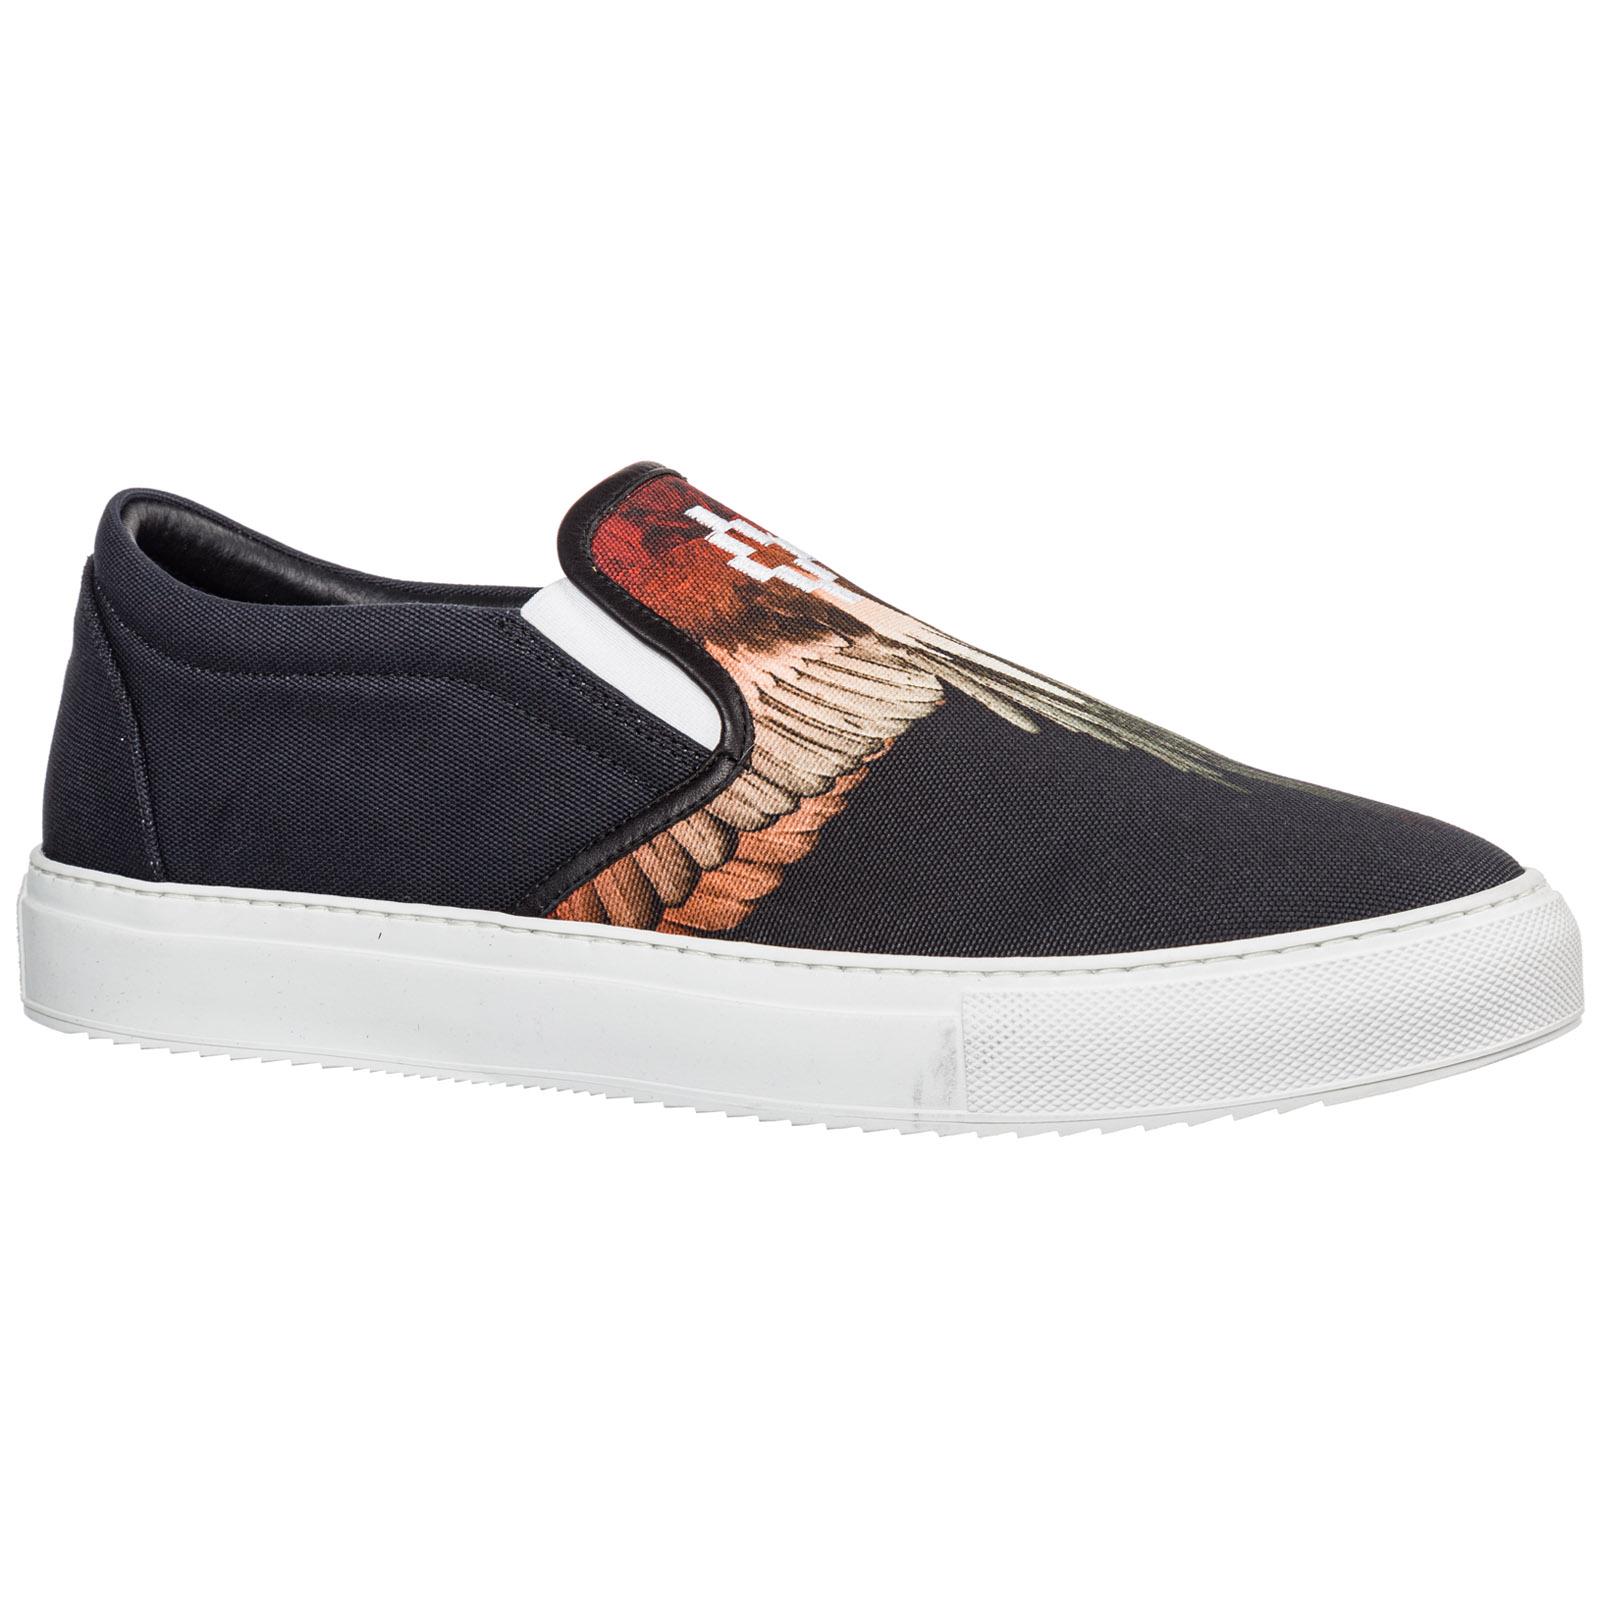 best service 56888 aa888 Men's slip on sneakers